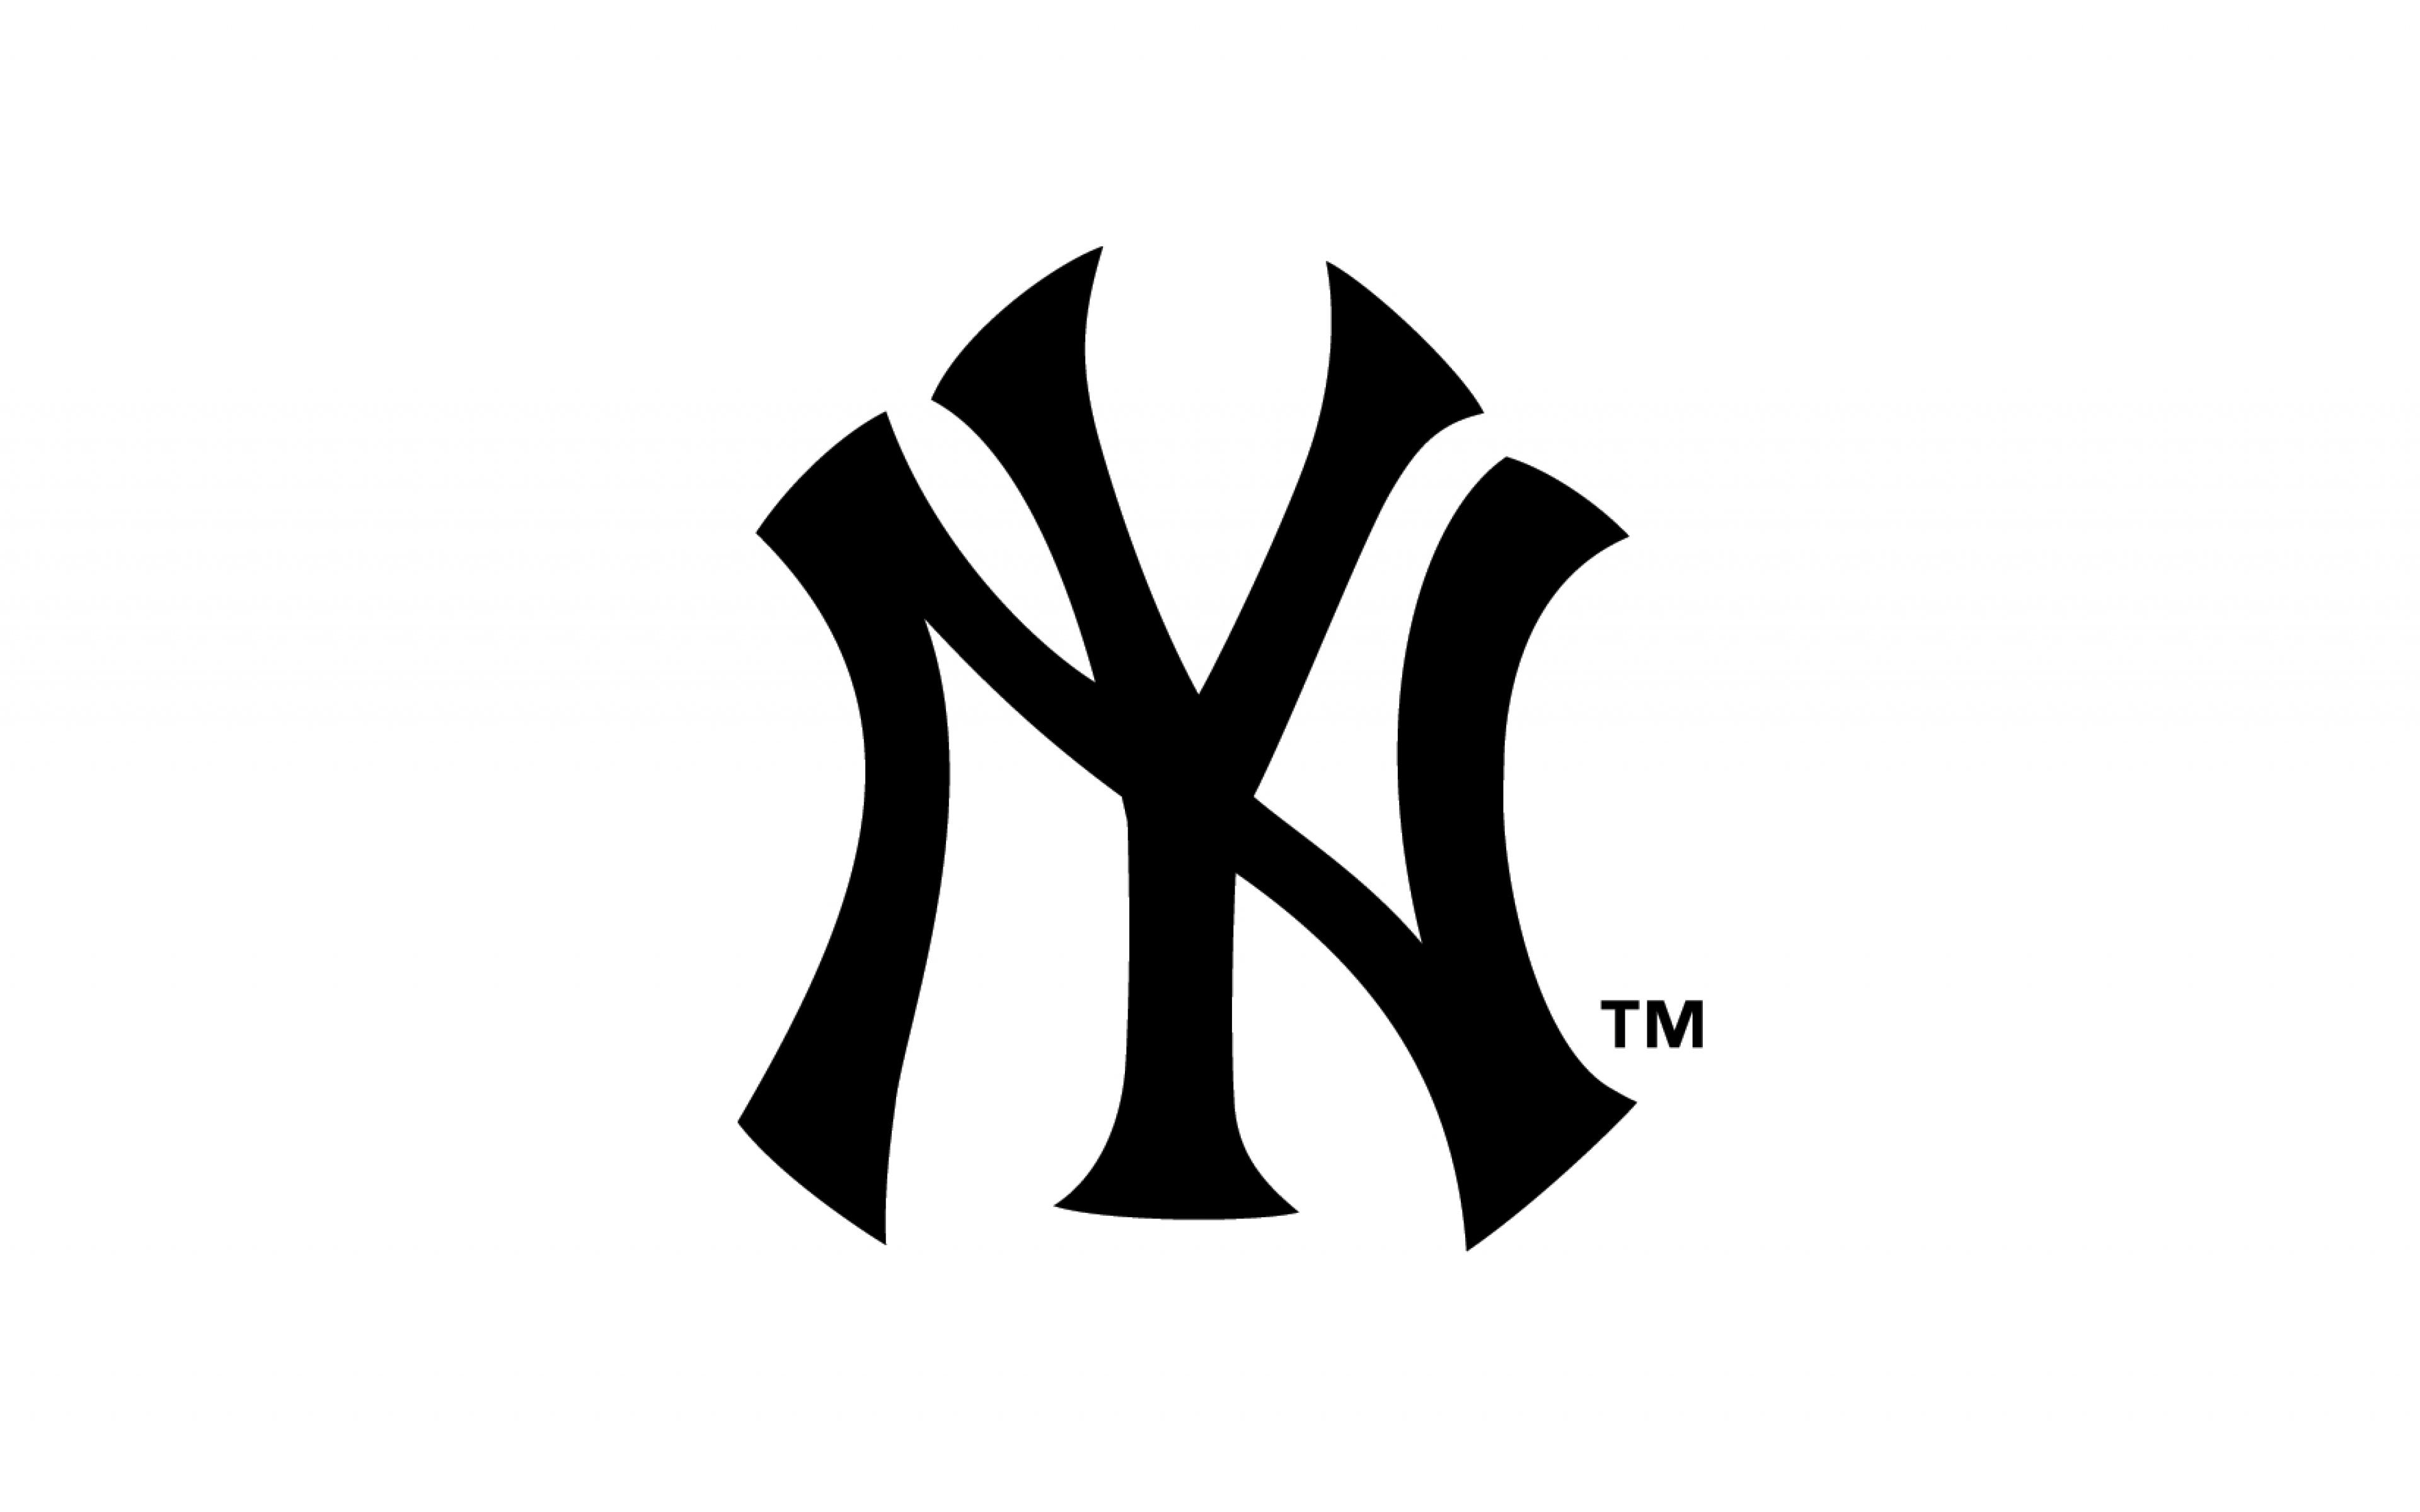 Download Wallpaper 3840x2400 New york yankees Logo 3840x2400